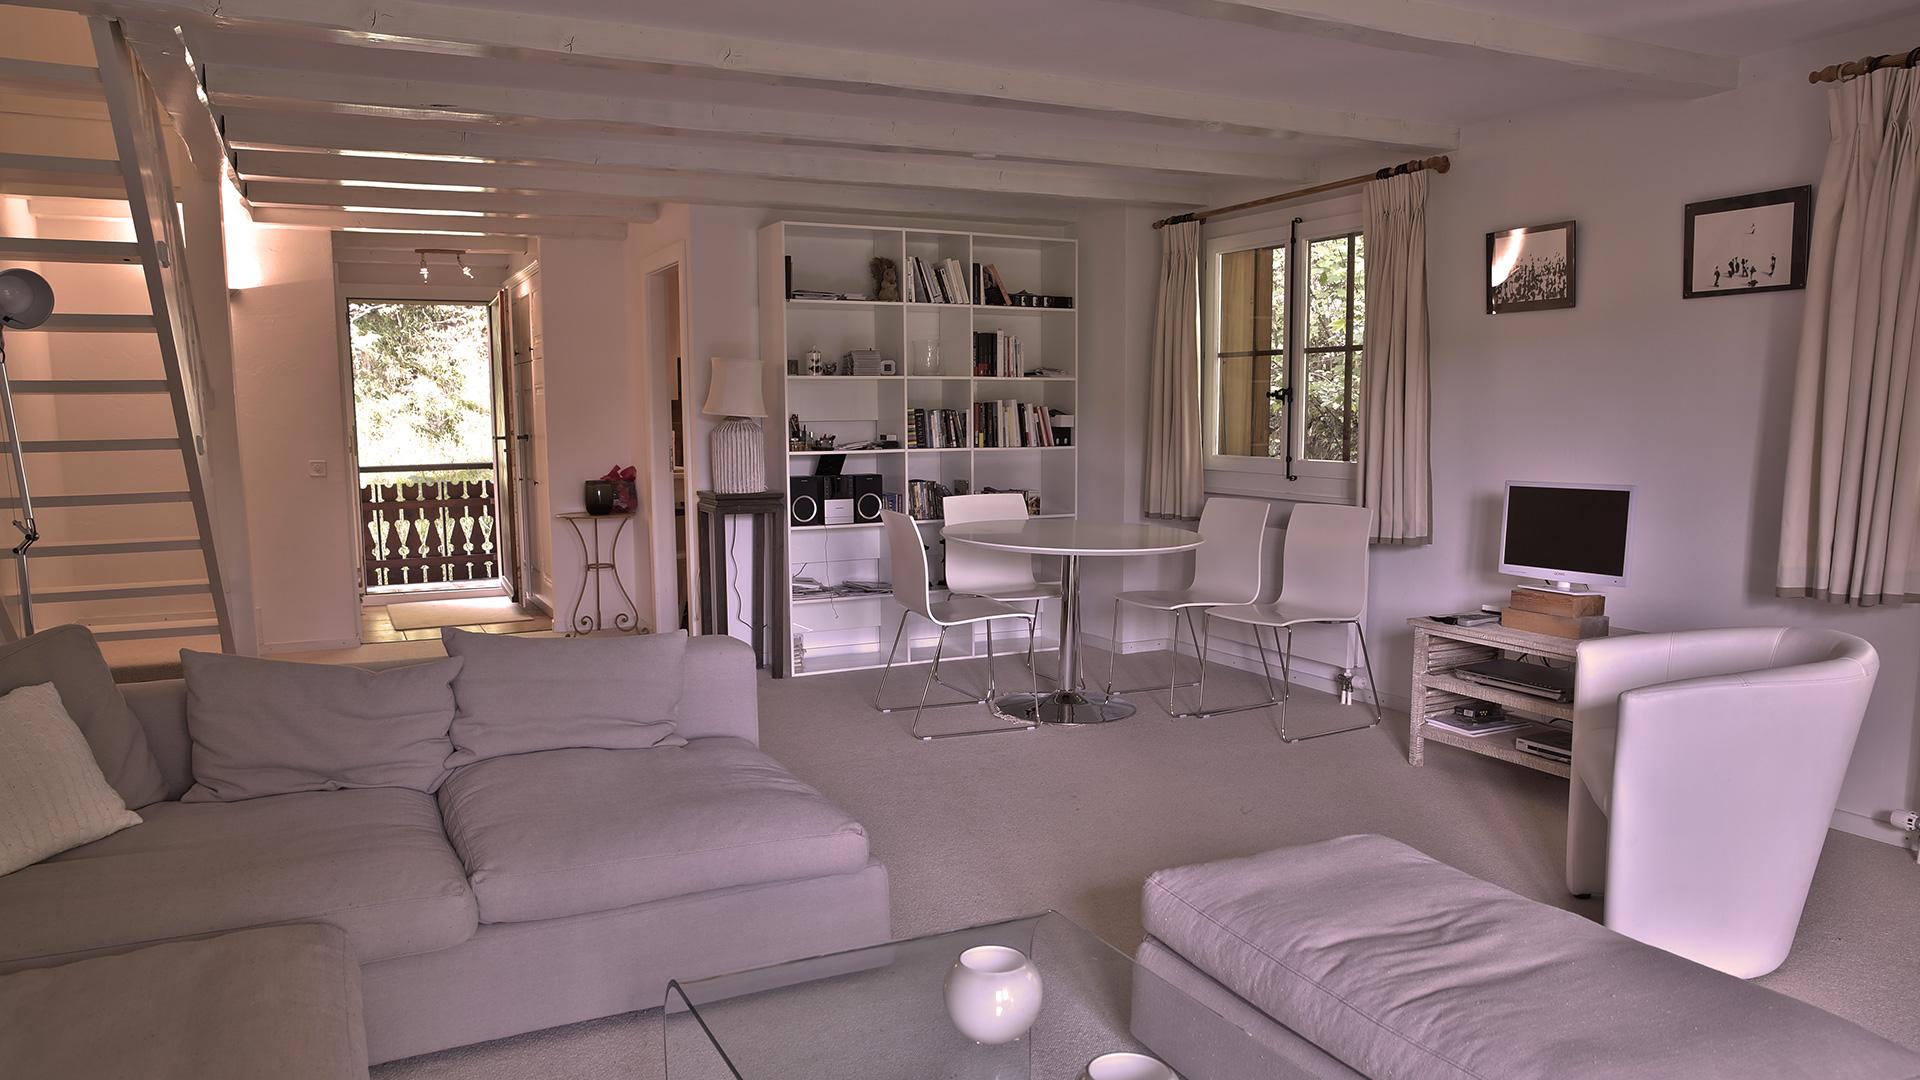 Les Renardines 2 Apartments, Switzerland